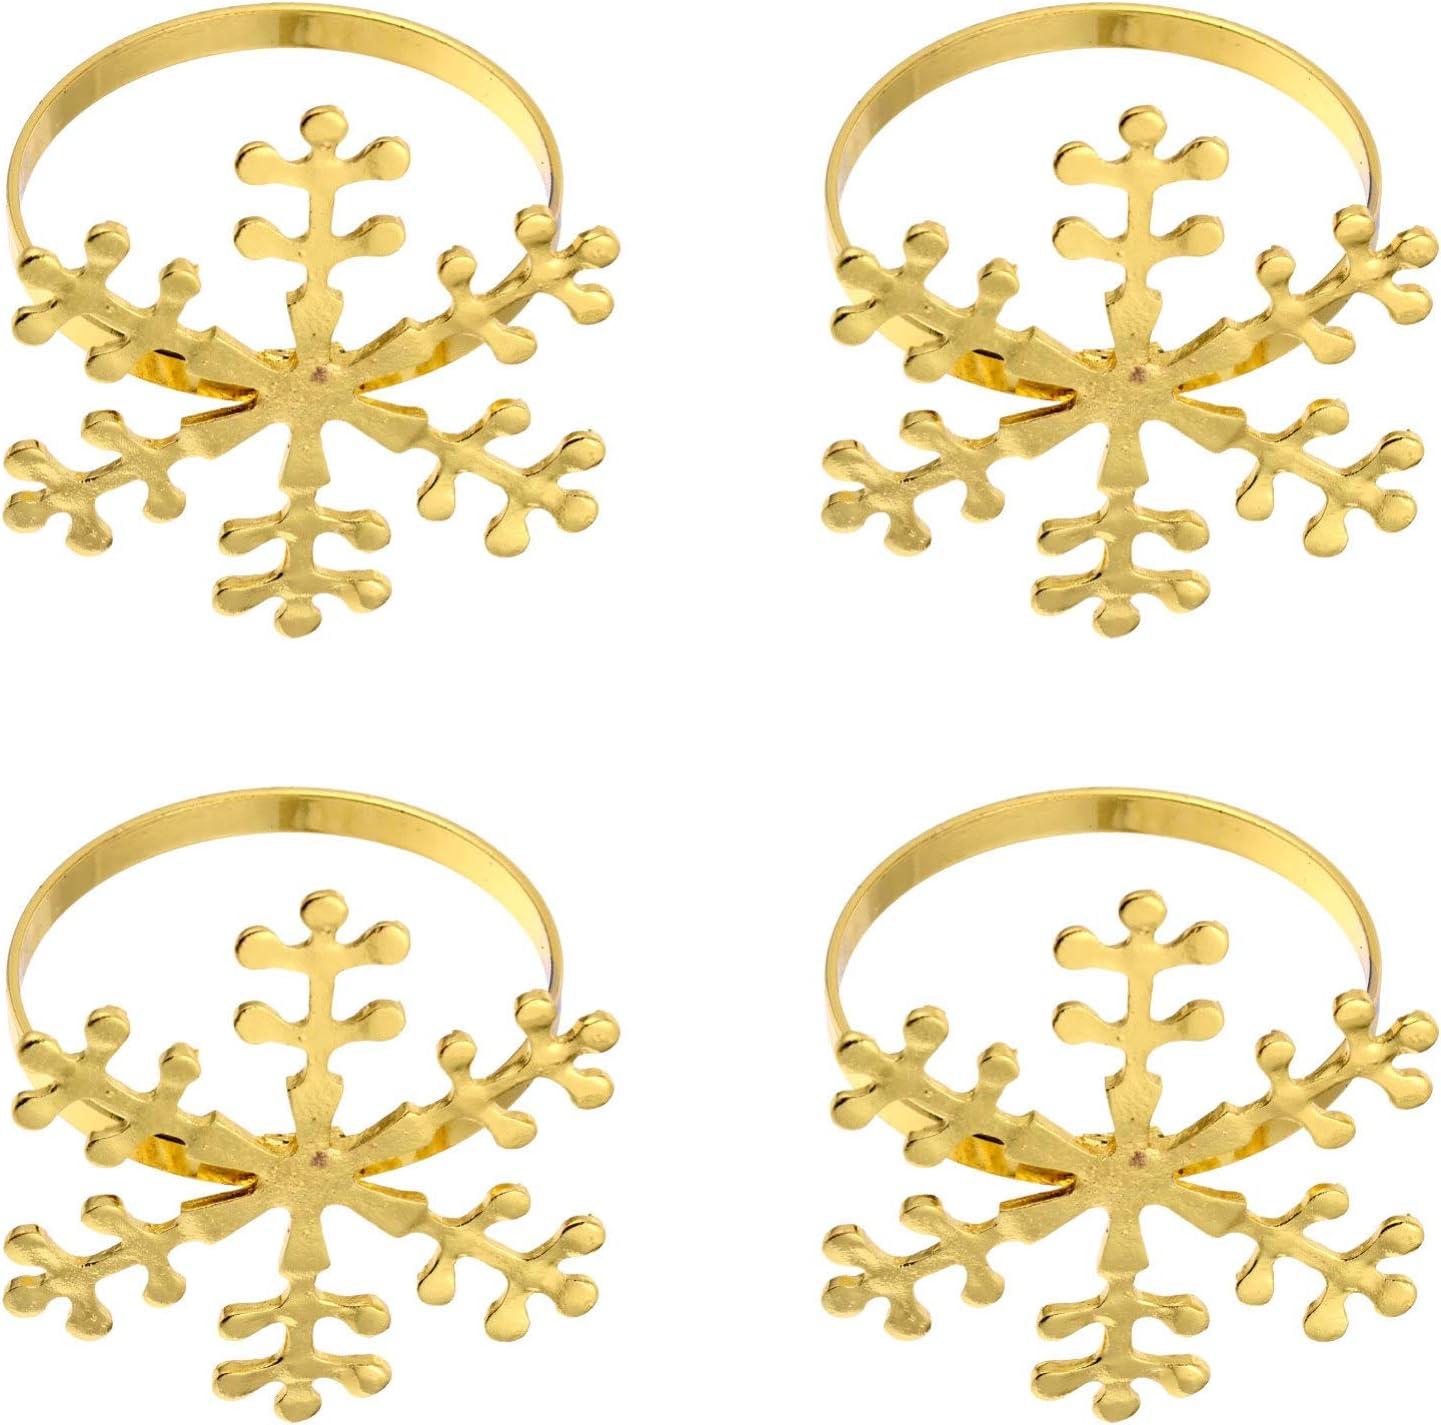 Yardwe 4pcs Christmas Napkin Snowflake Buck Holders Max 72% 67% OFF of fixed price OFF Rings